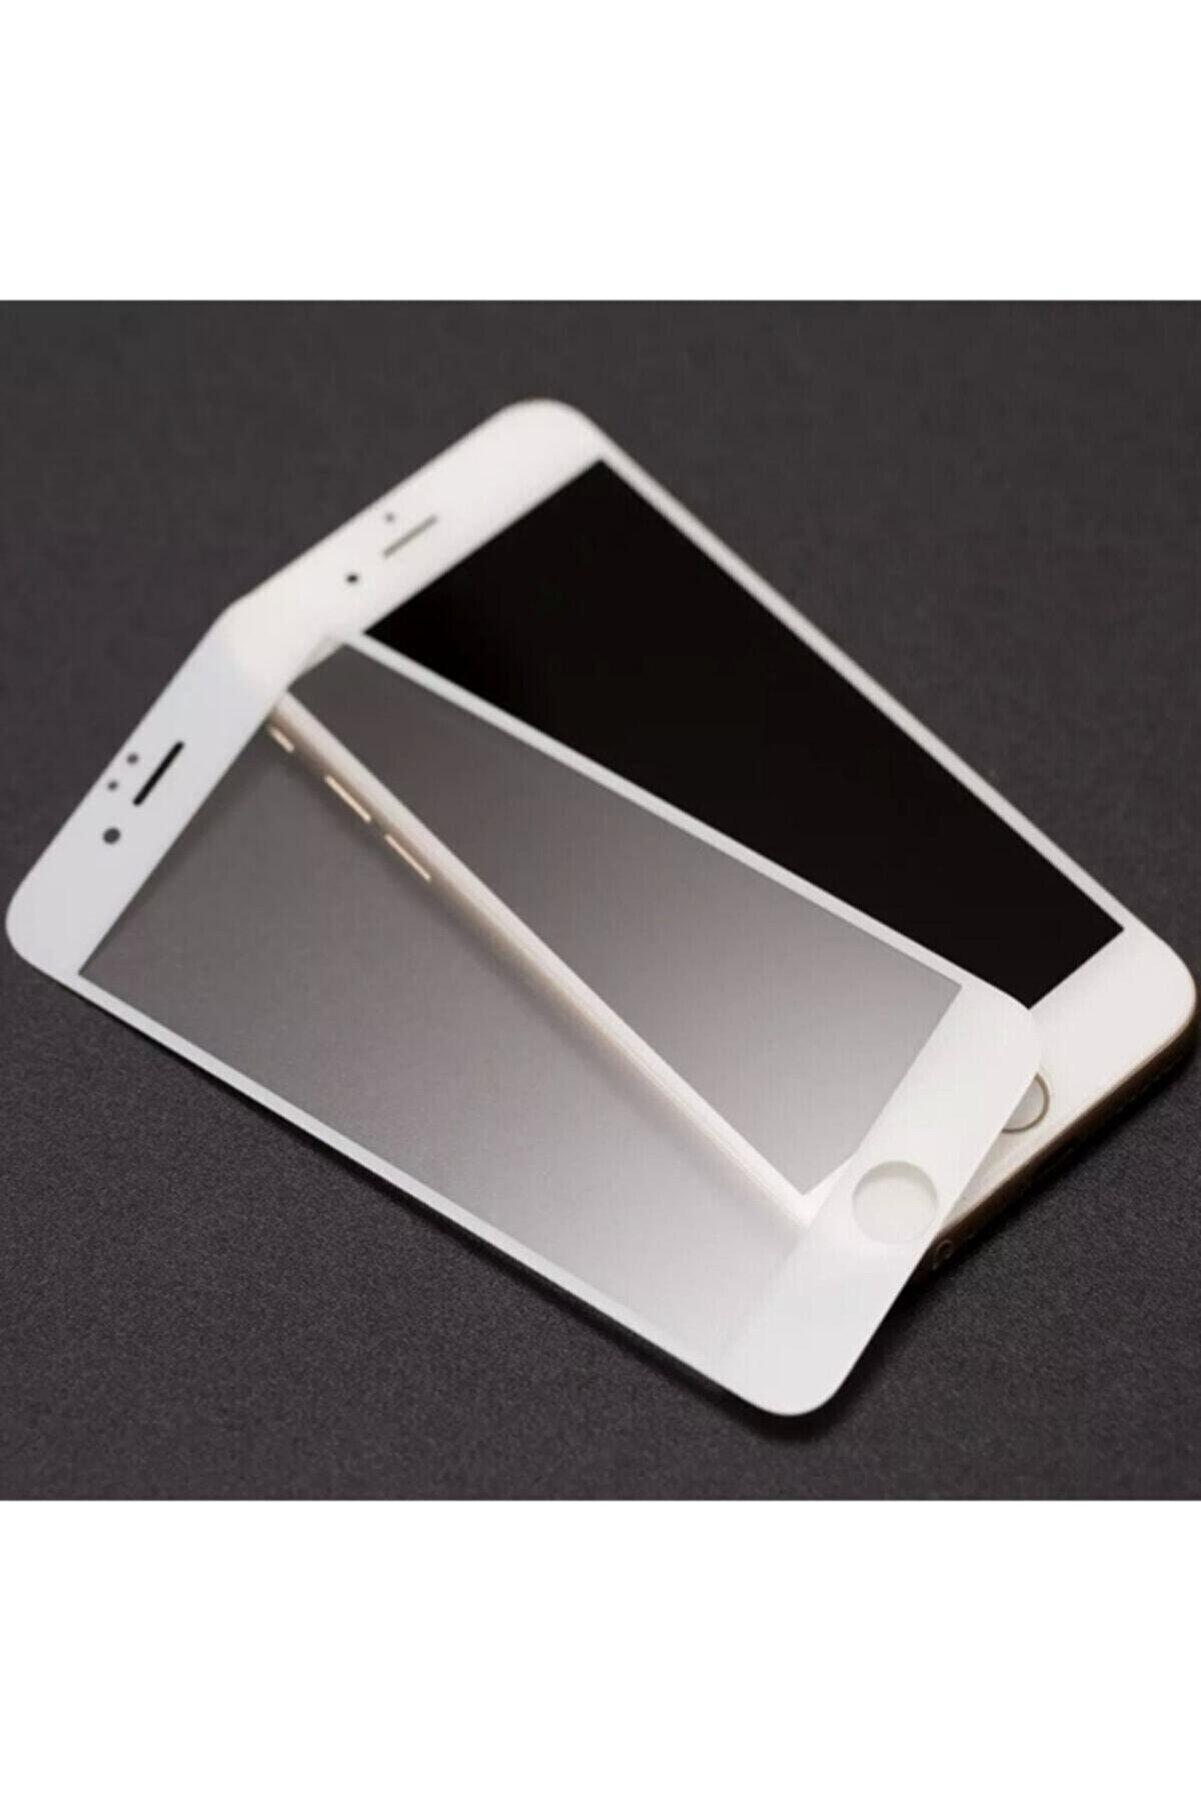 Telehome Iphone 8 Plus Mat Kırılmaz Cam Nano Parmak Izi Bırakmaz Beyaz